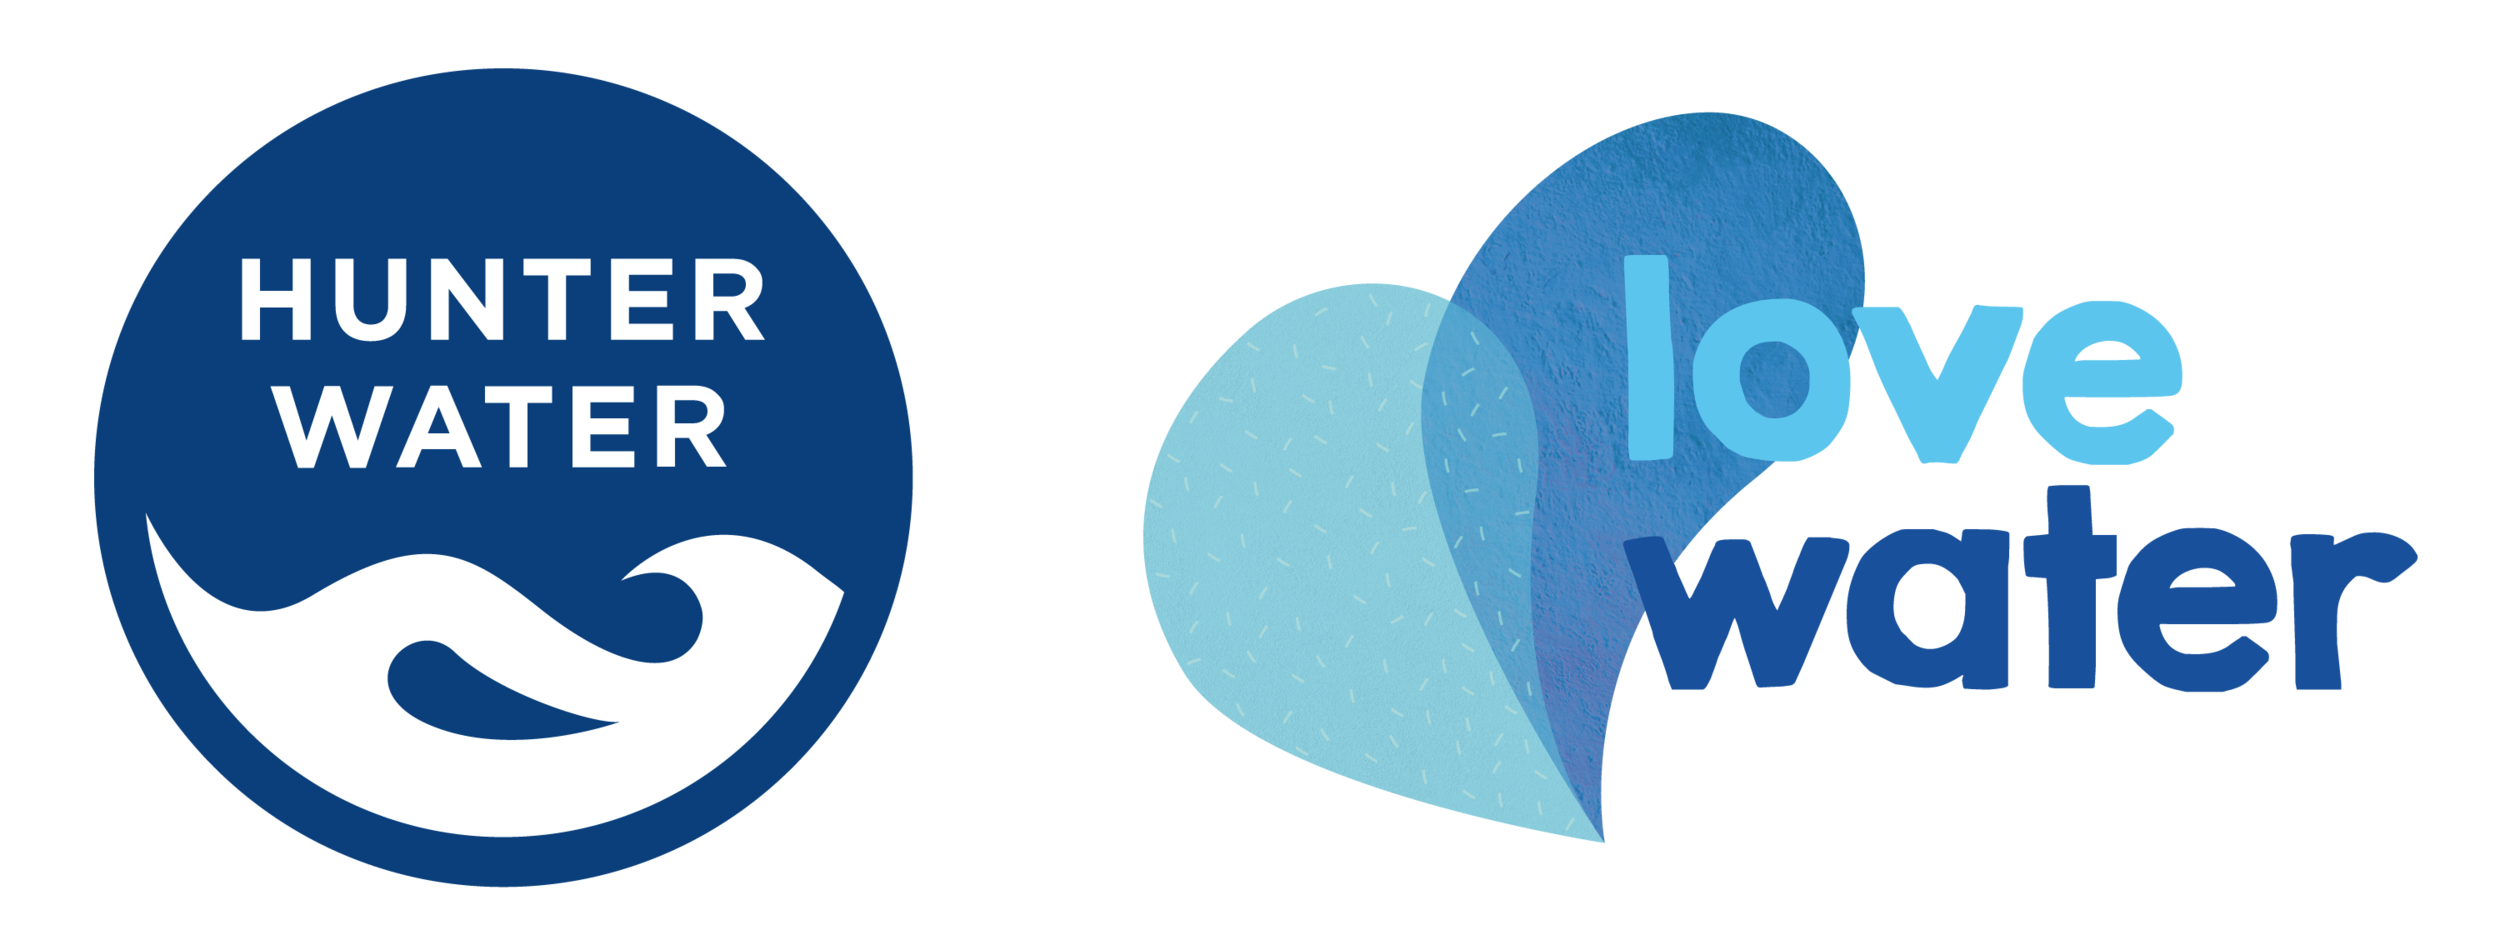 HunterWater_LoveWater_Logo_Small_CMYK.PNG